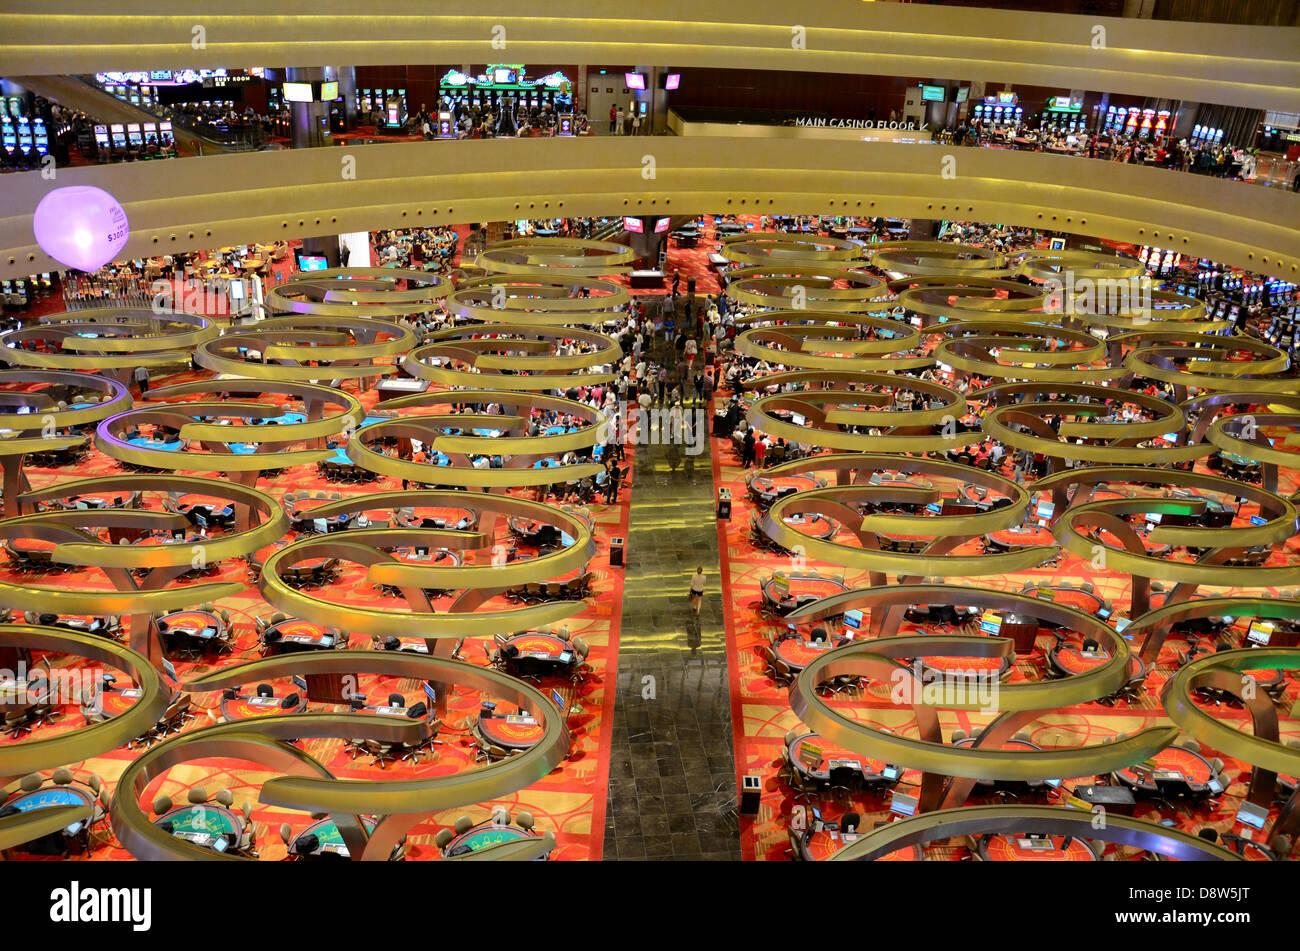 Singapore casino marina bay free for fun casino games no download